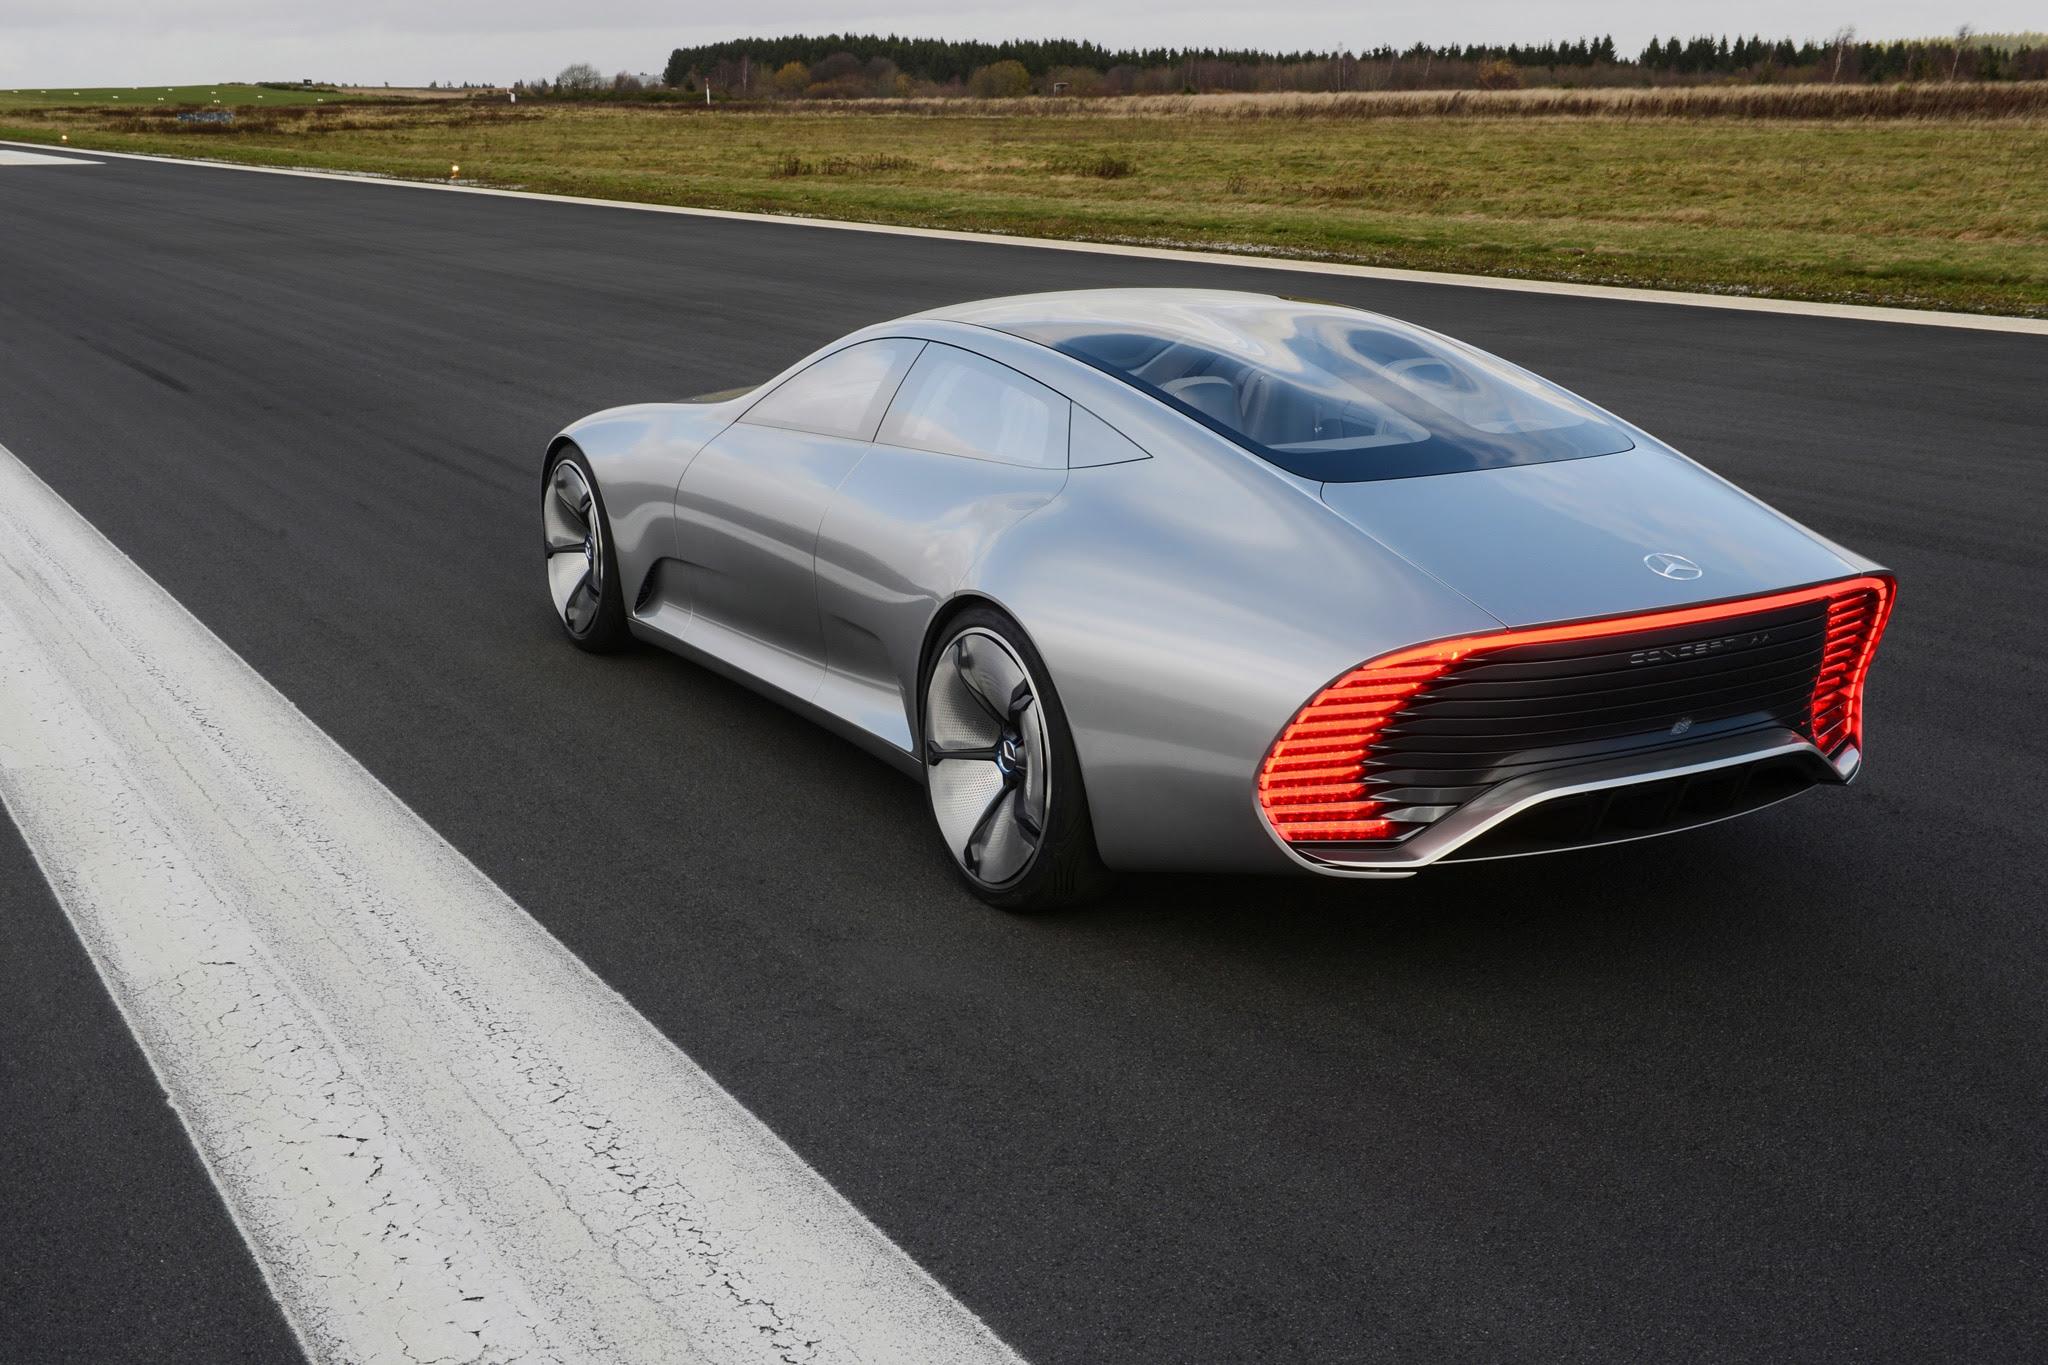 Mercedes-Benz Concept IAA Exclusive Drive